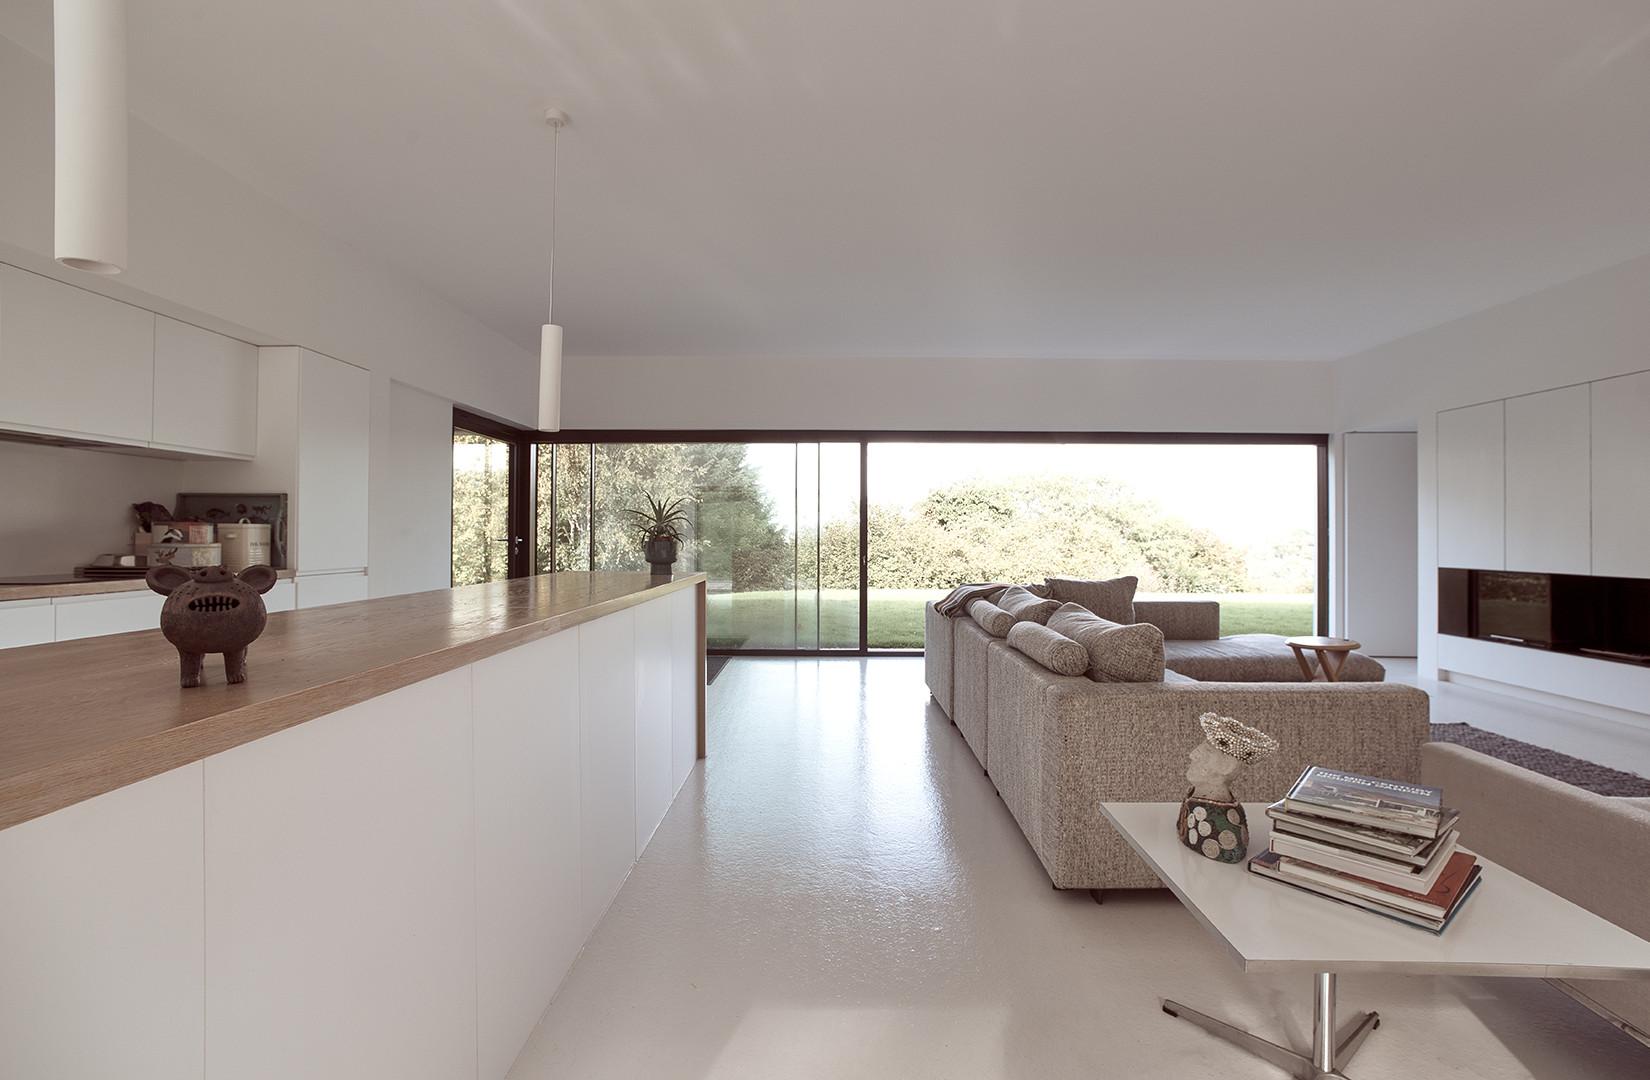 Architect: Daniel Bär Architect Contract Administration through Scenic Lets Ltd